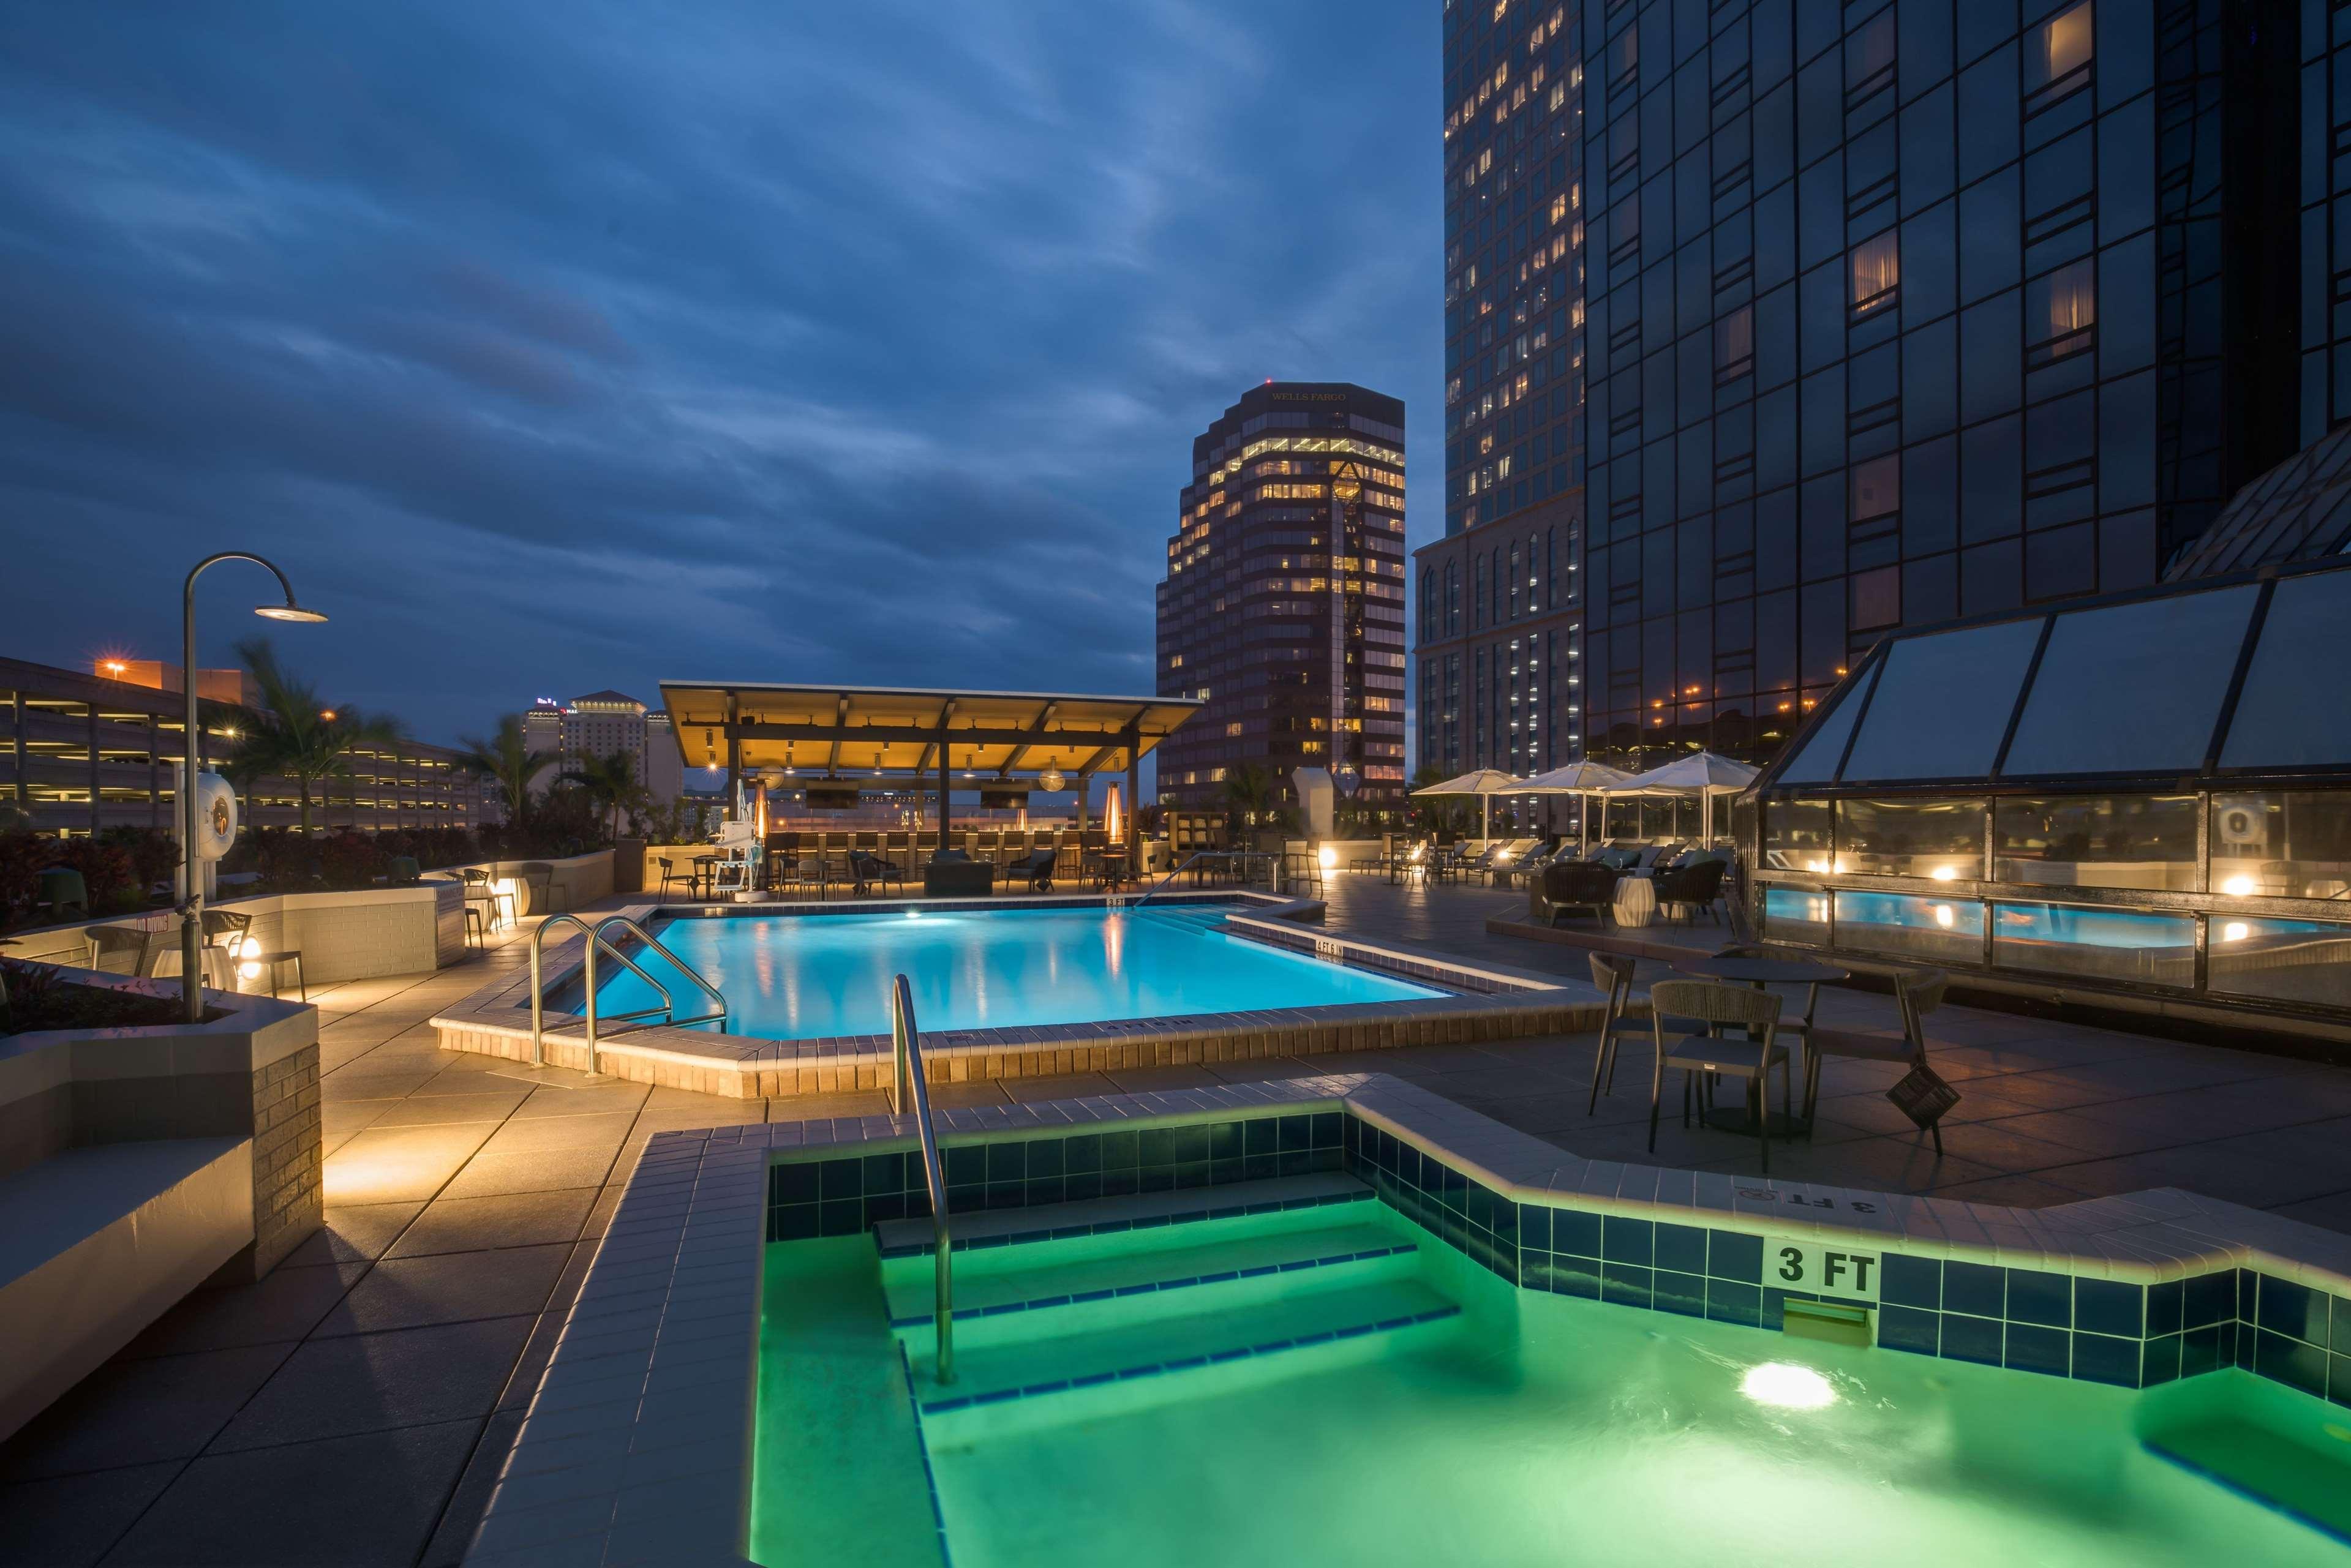 Hilton Tampa Downtown image 8